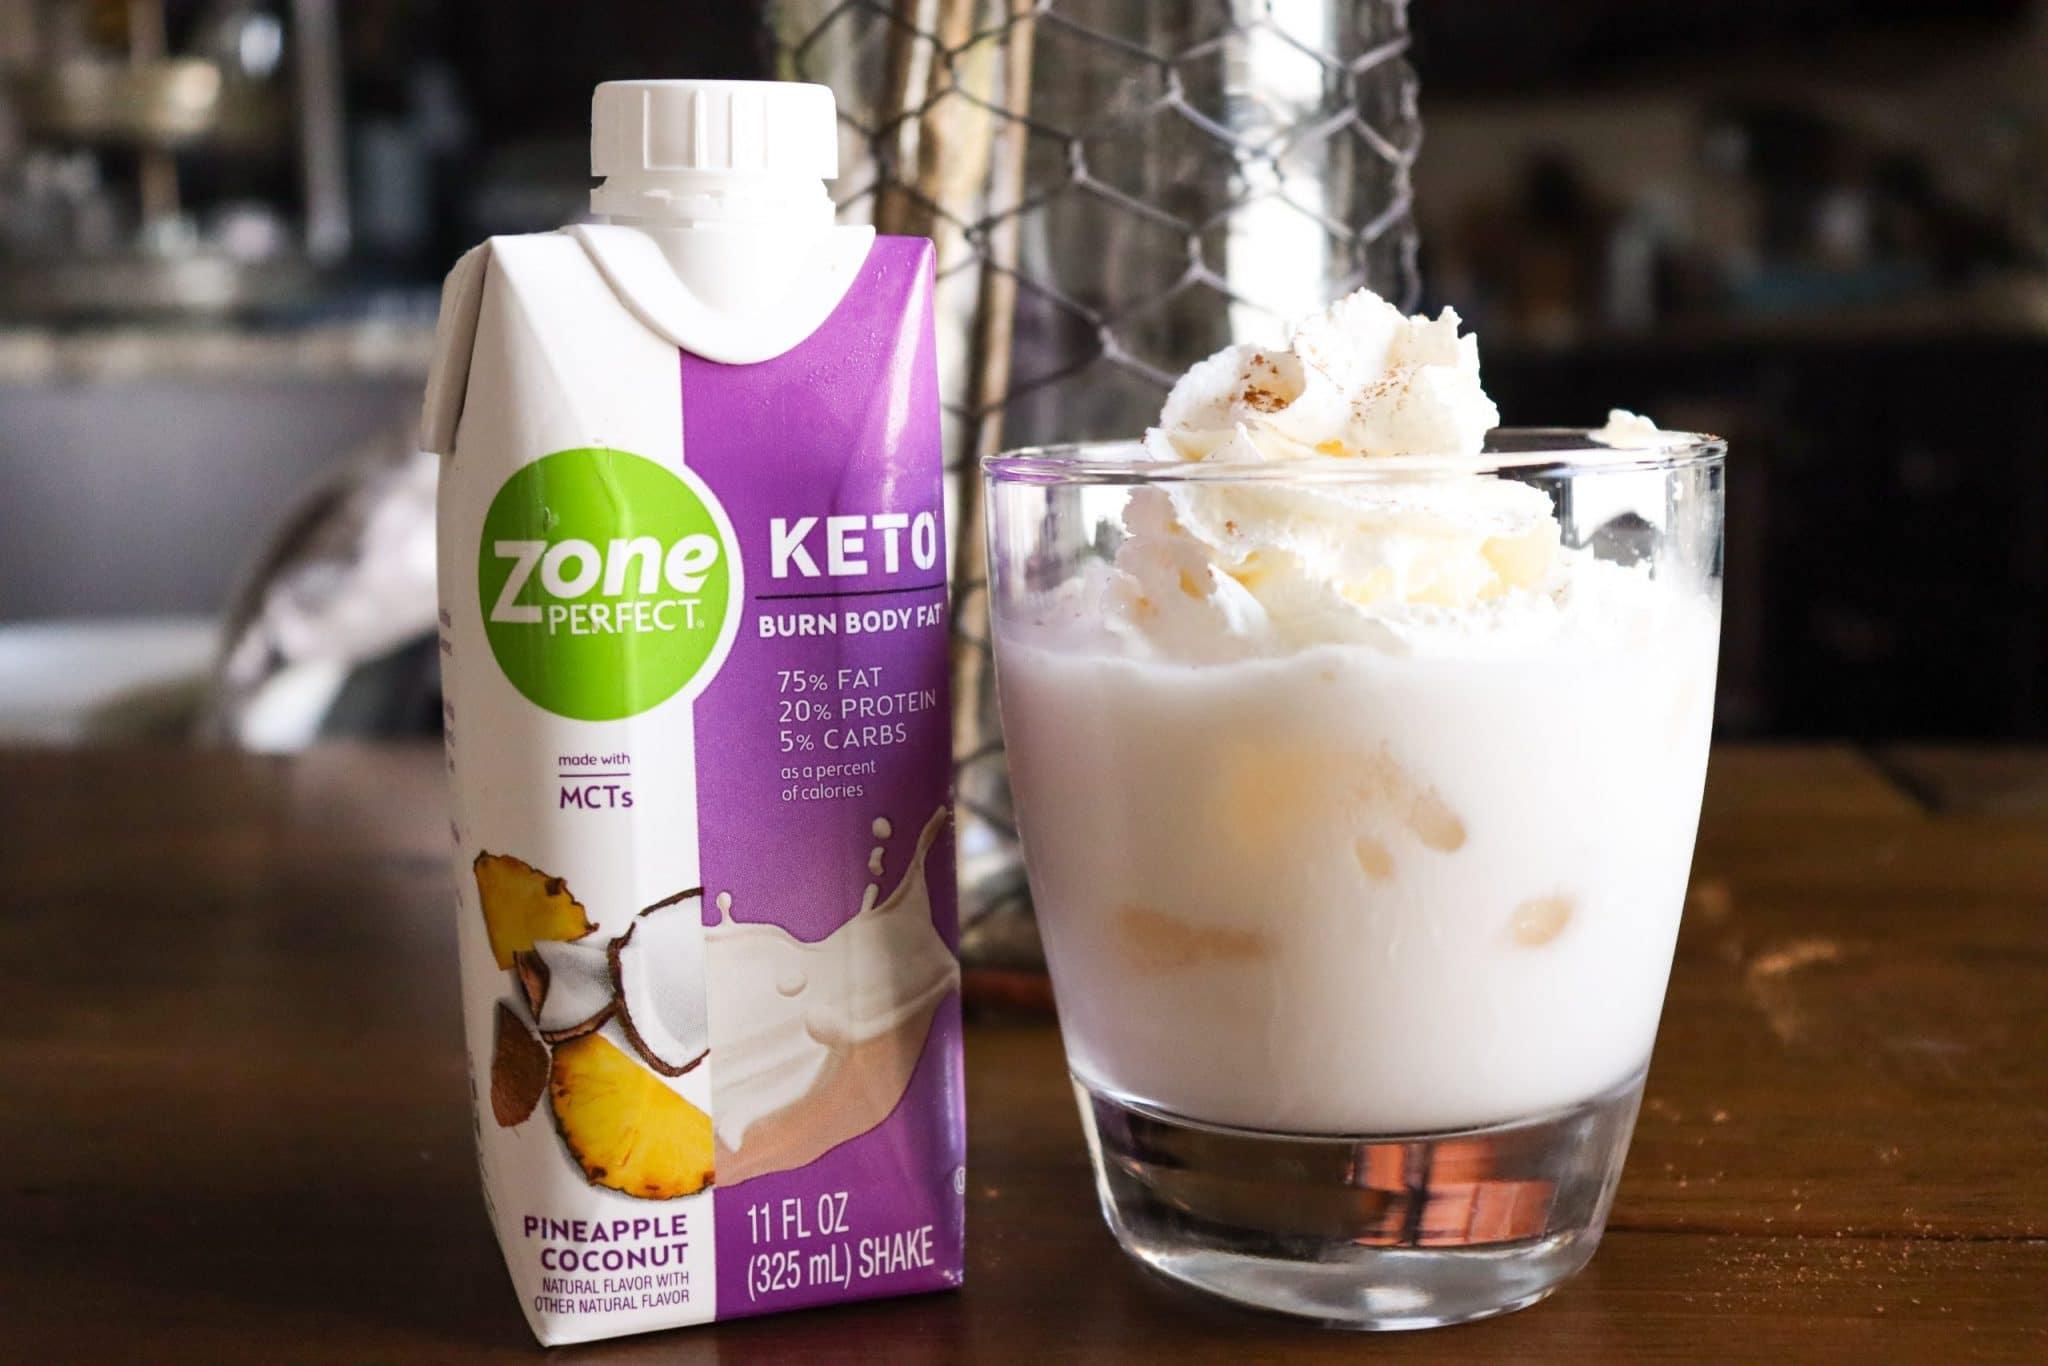 ZonePerfect Keto Shakes glass with shake sugar free whipped cream